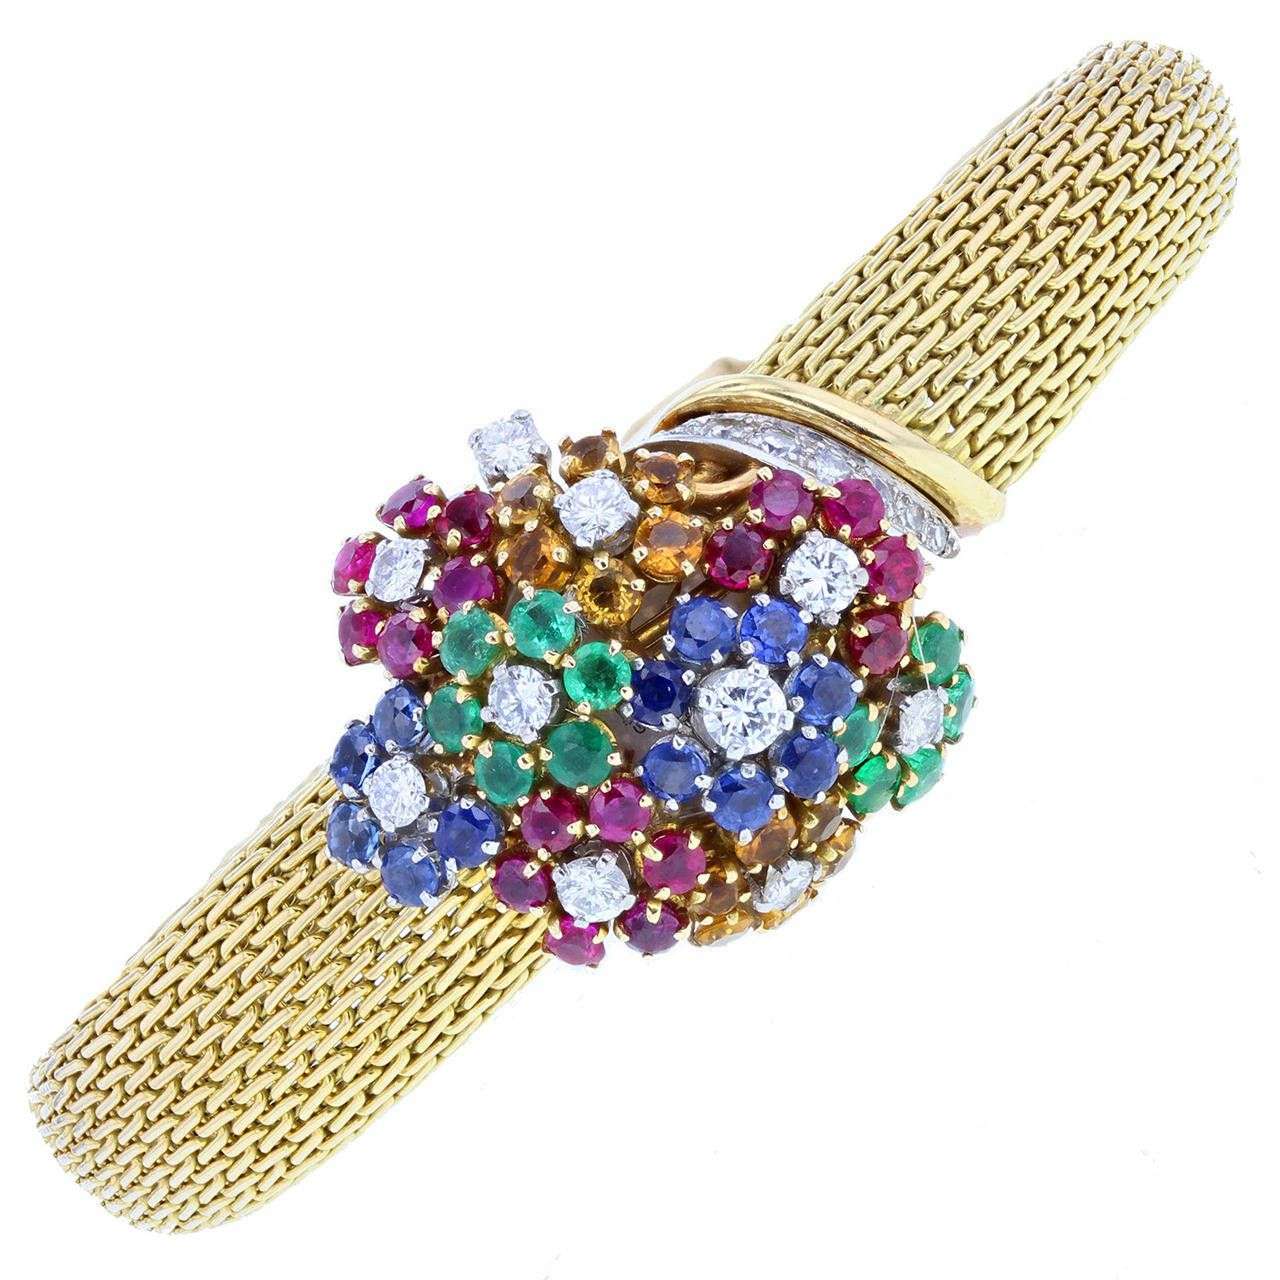 Gubelin Lady's Yellow Gold Multigem Cocktail Wristwatch